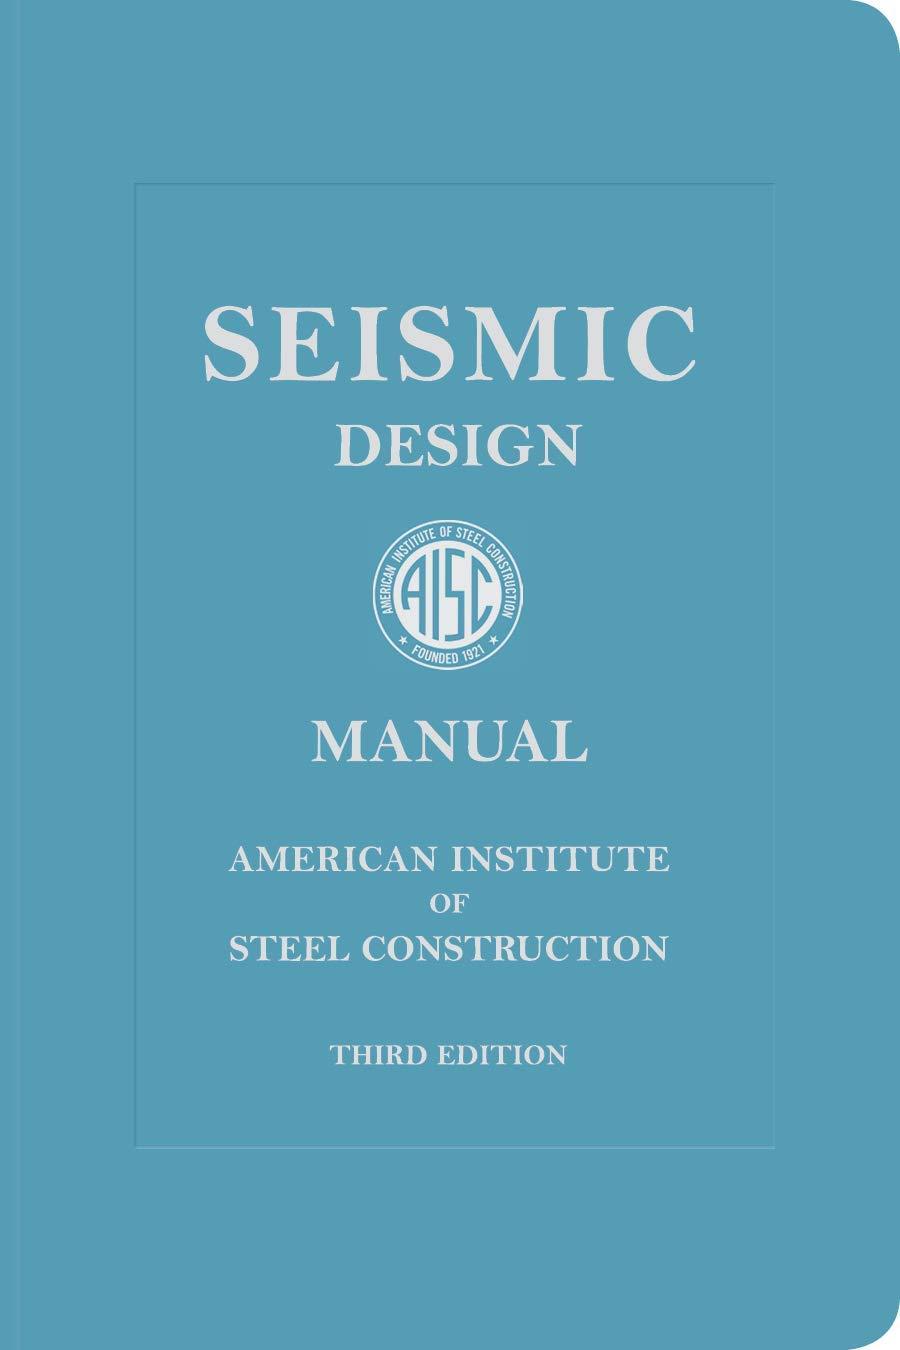 Seismic Design Manual, 3rd Edition: American Institute of Steel  Construction: 9781564240354: Amazon.com: Books